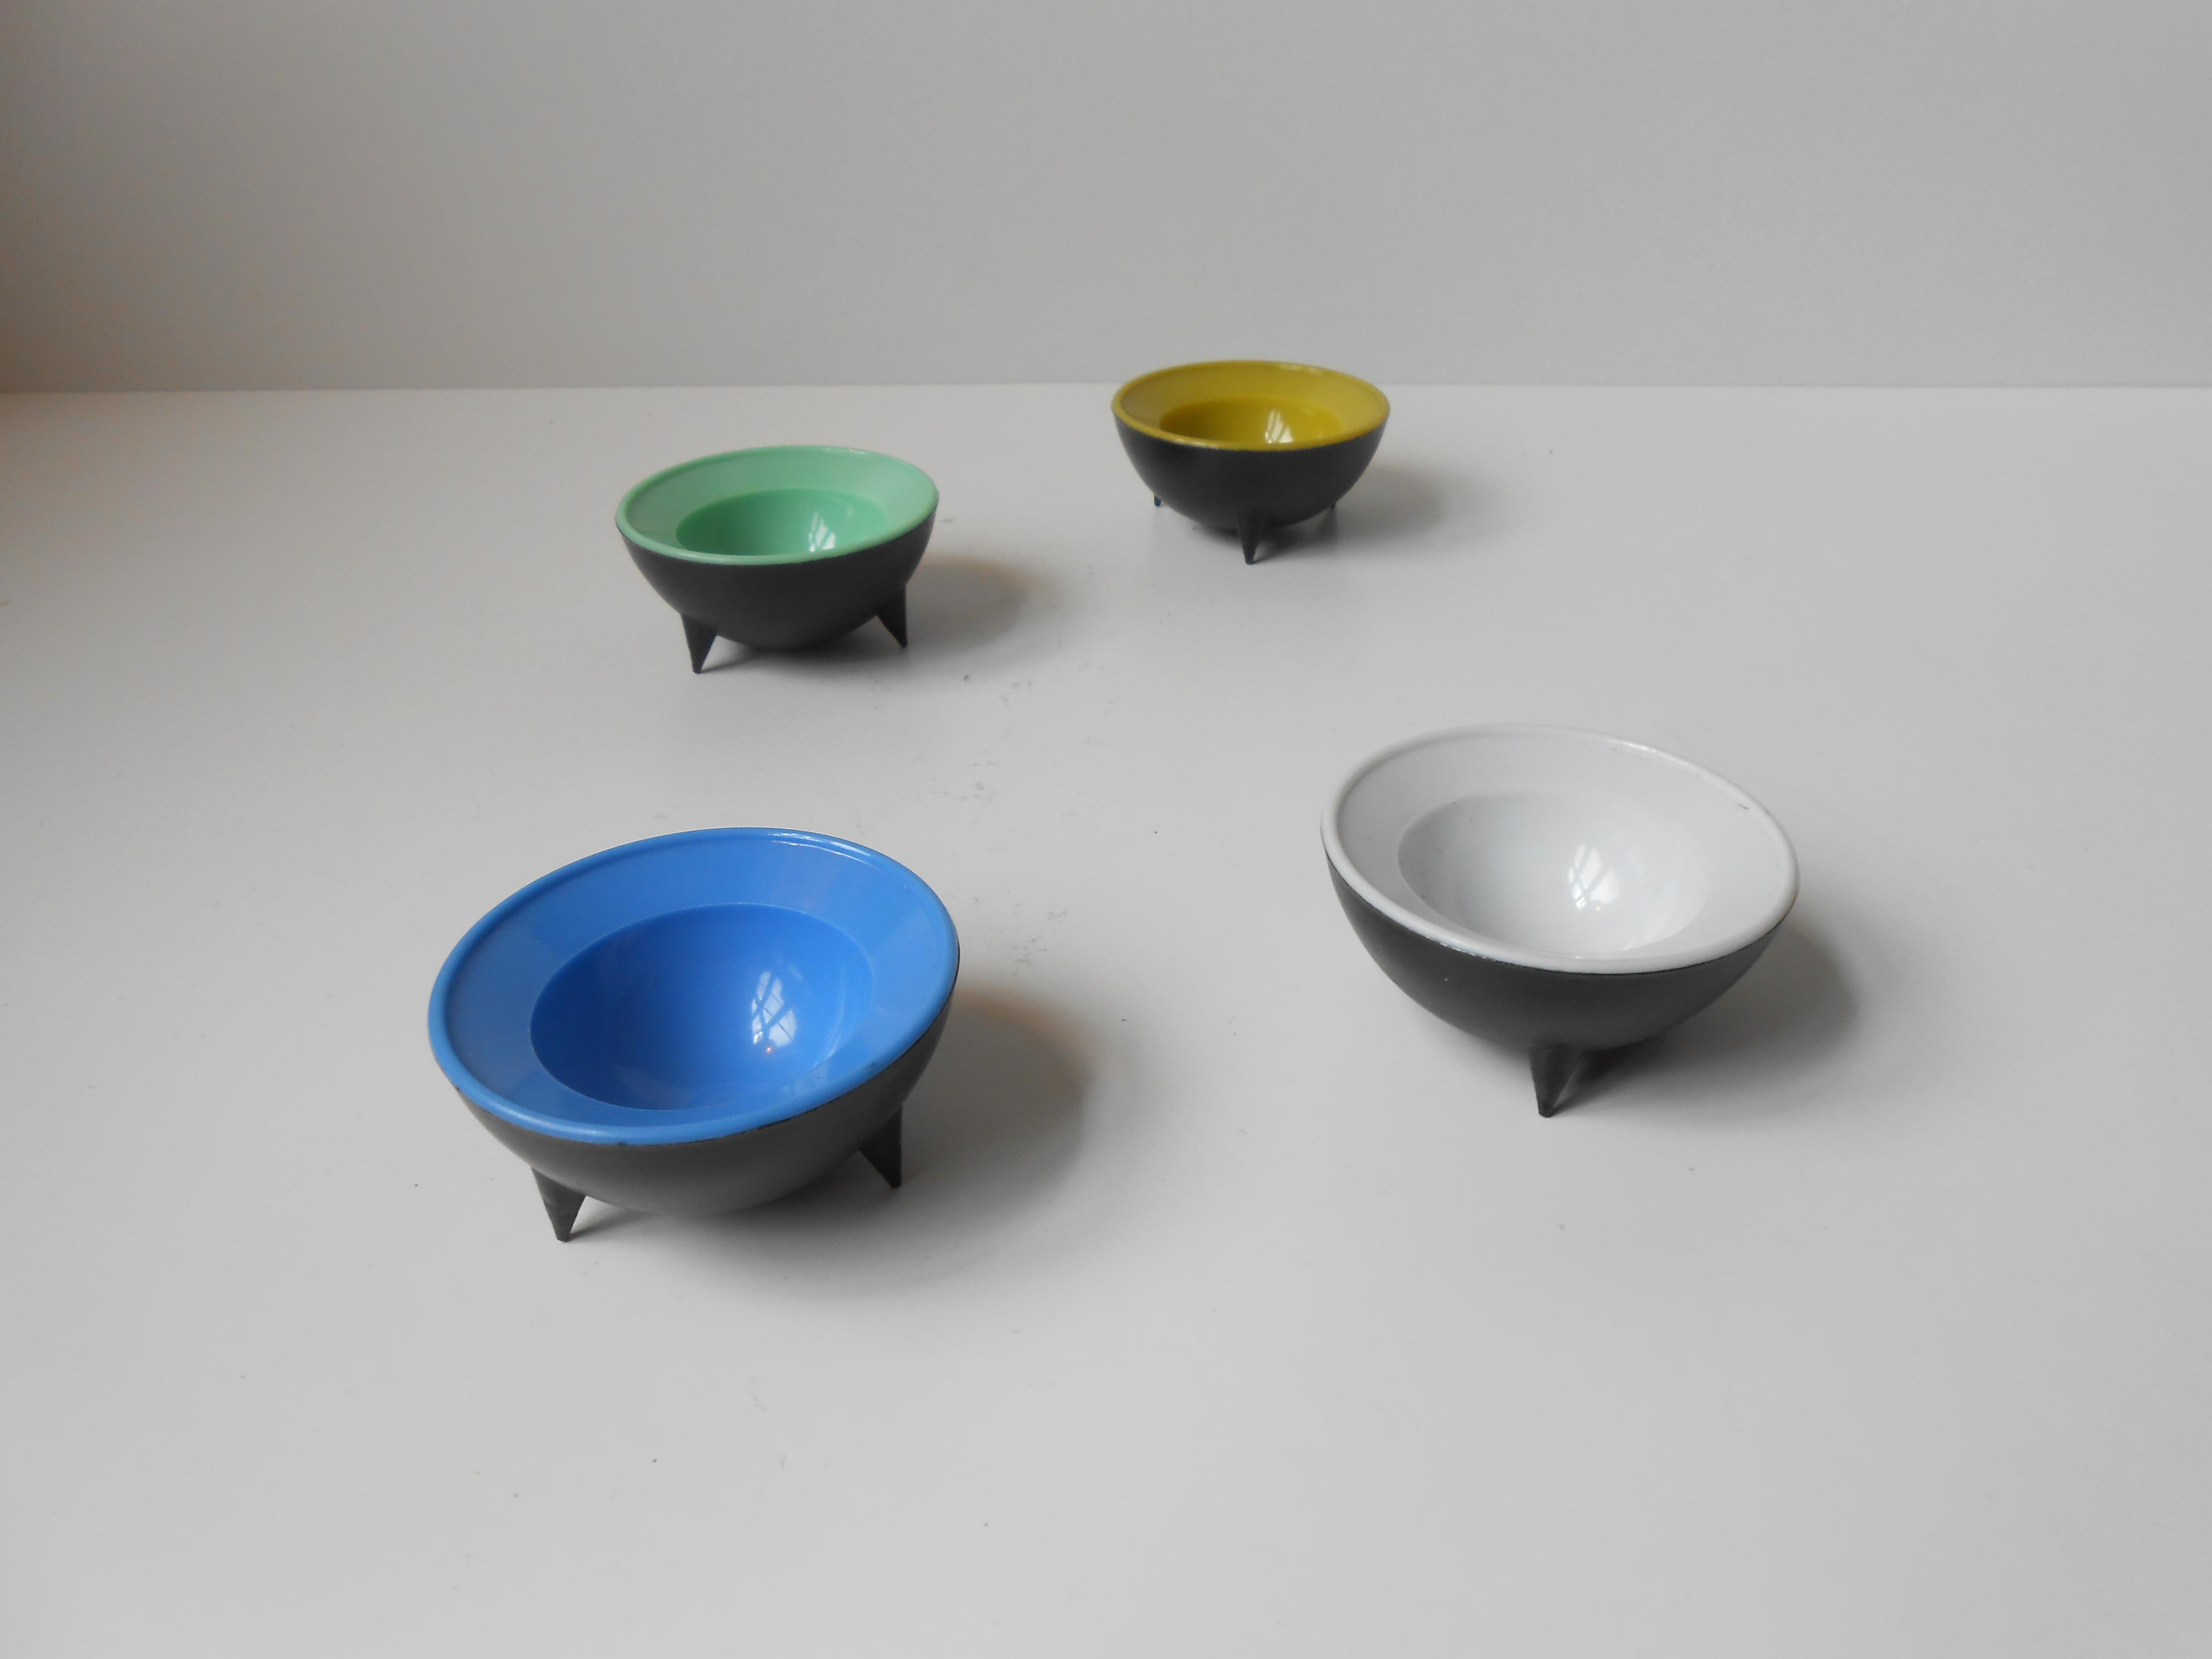 4 retro æggebægre i kulørt plast: ca 1970 – retro-design.dk